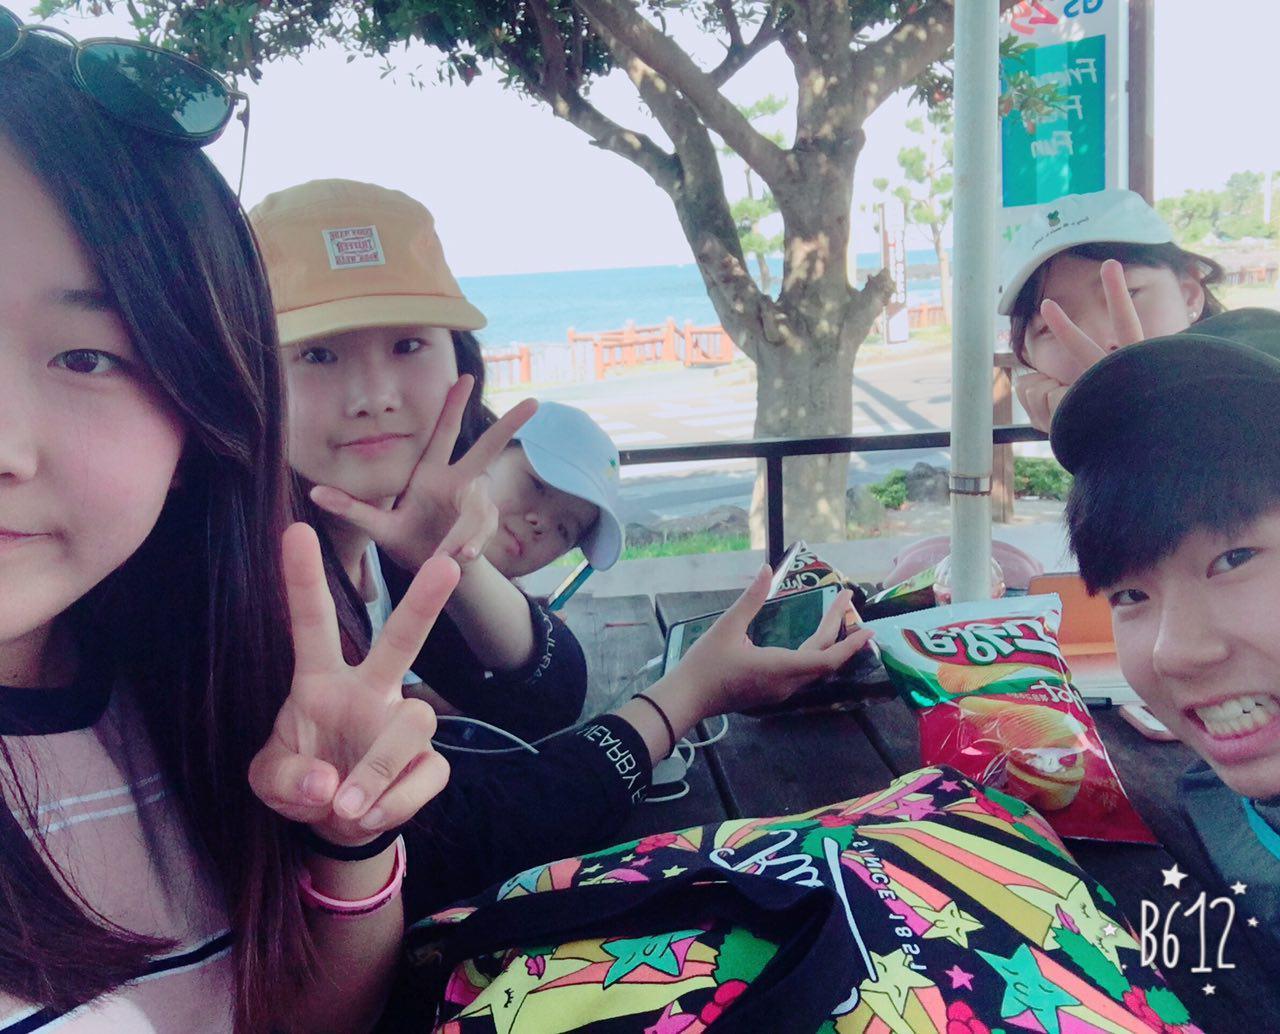 photo_2017-05-29_16-21-09.jpg